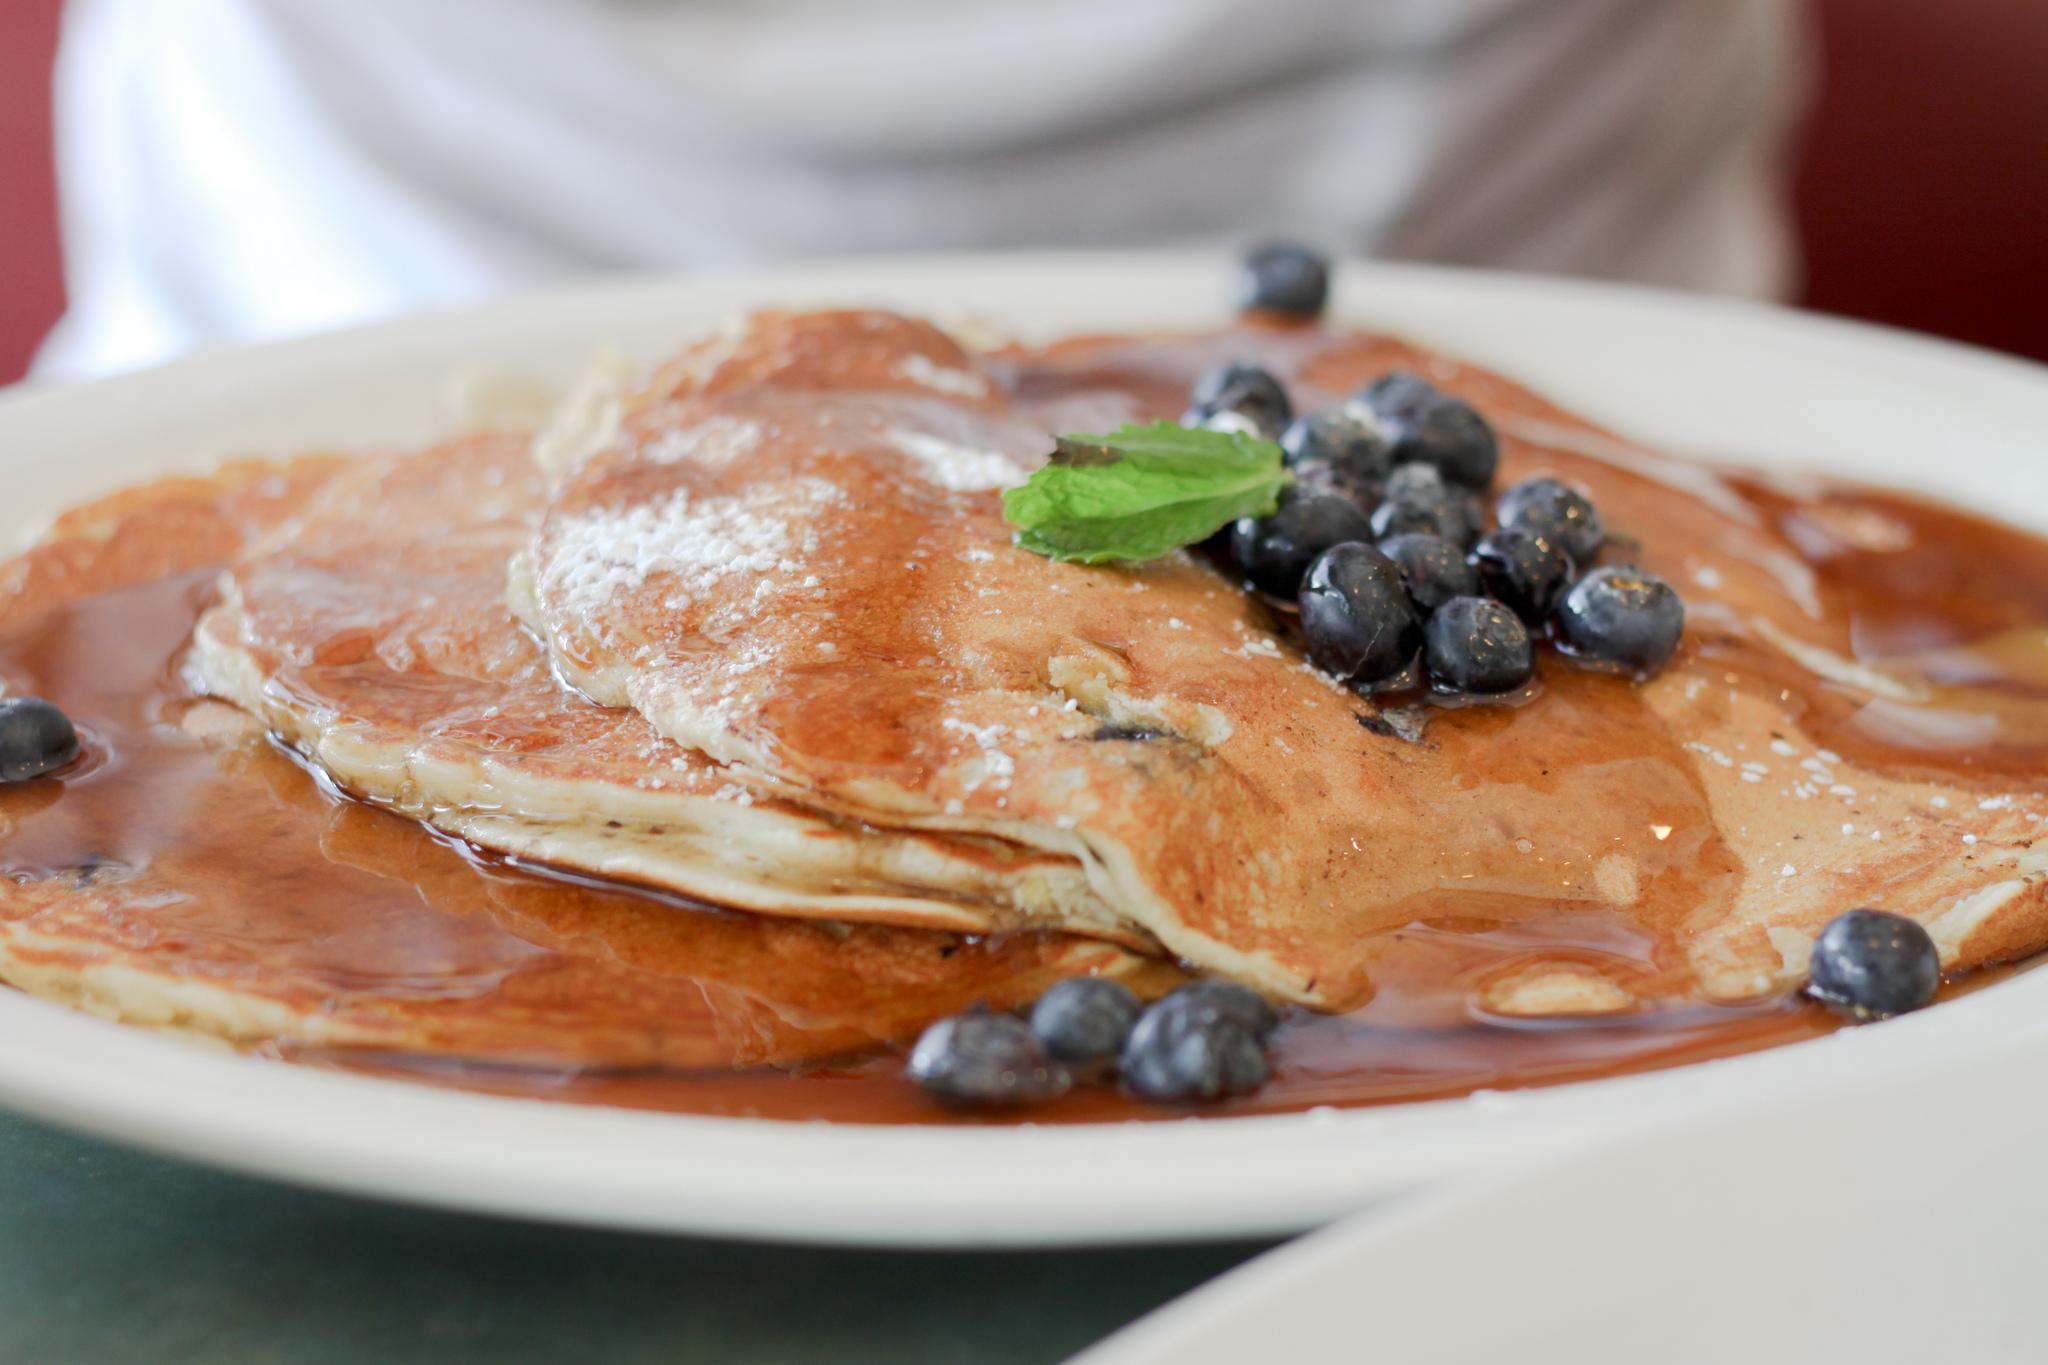 blueberry lemon pancakes| © haiderzs/flickr